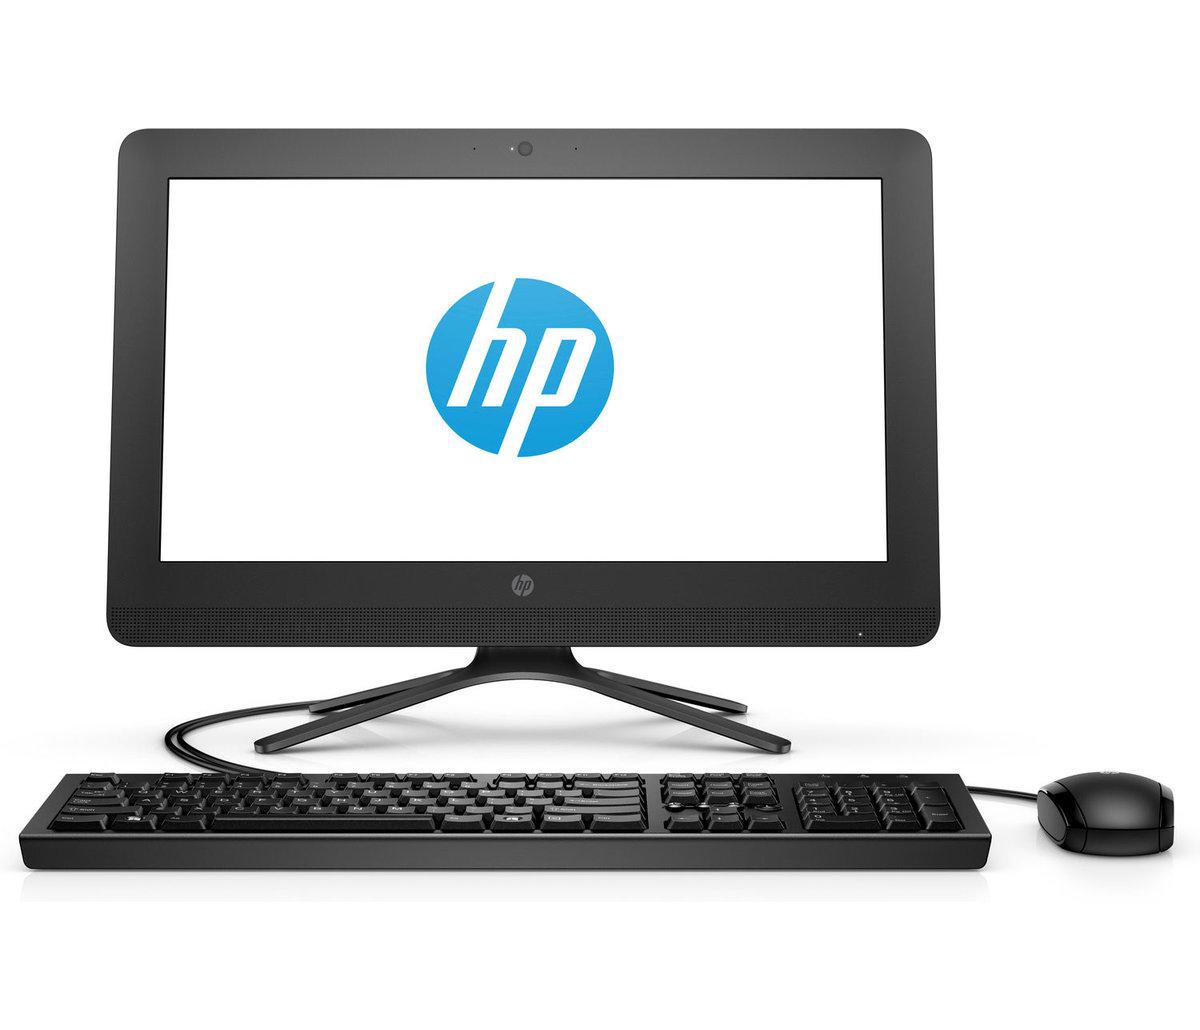 HP 20-C422in 3JV45AA(BLK) AMD E2 9000 Latest 4 GB 1 TBWIN 10 Wired INT 1 YEAR Warranty